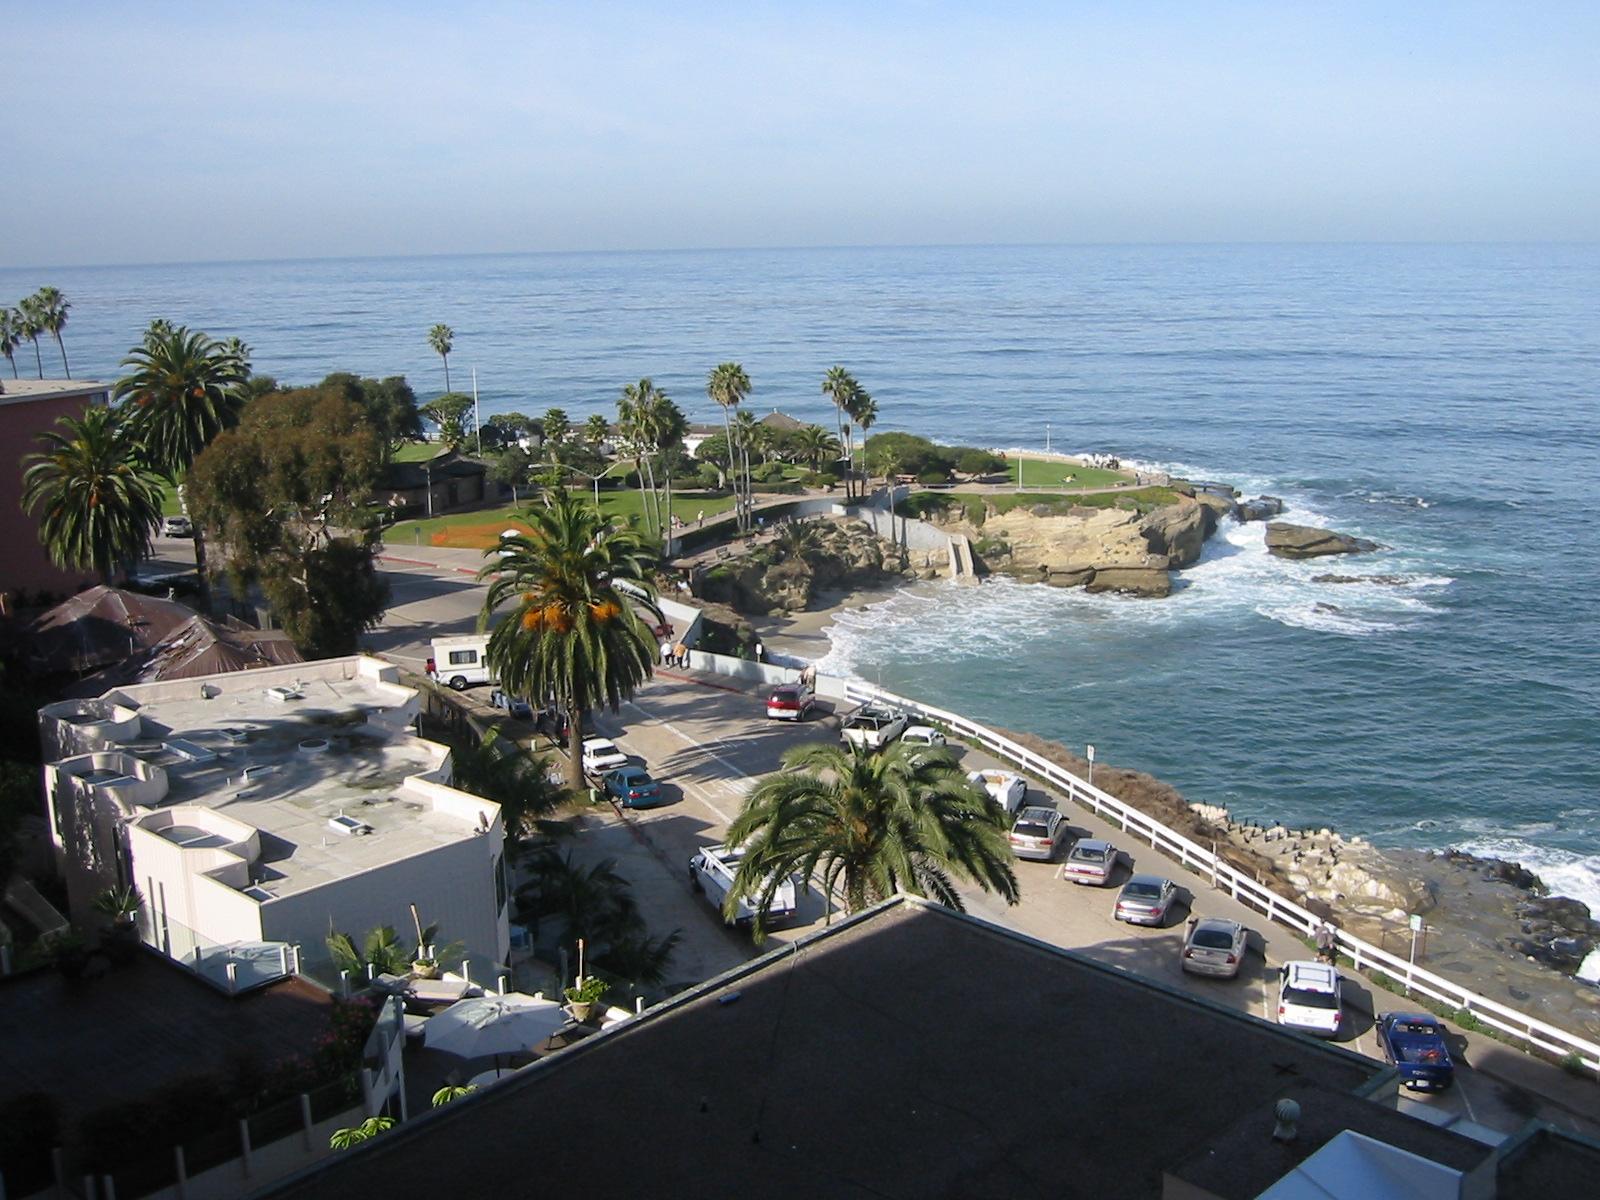 Pin La Jolla San Diego California United States Americas Wallpapers on 1600x1200